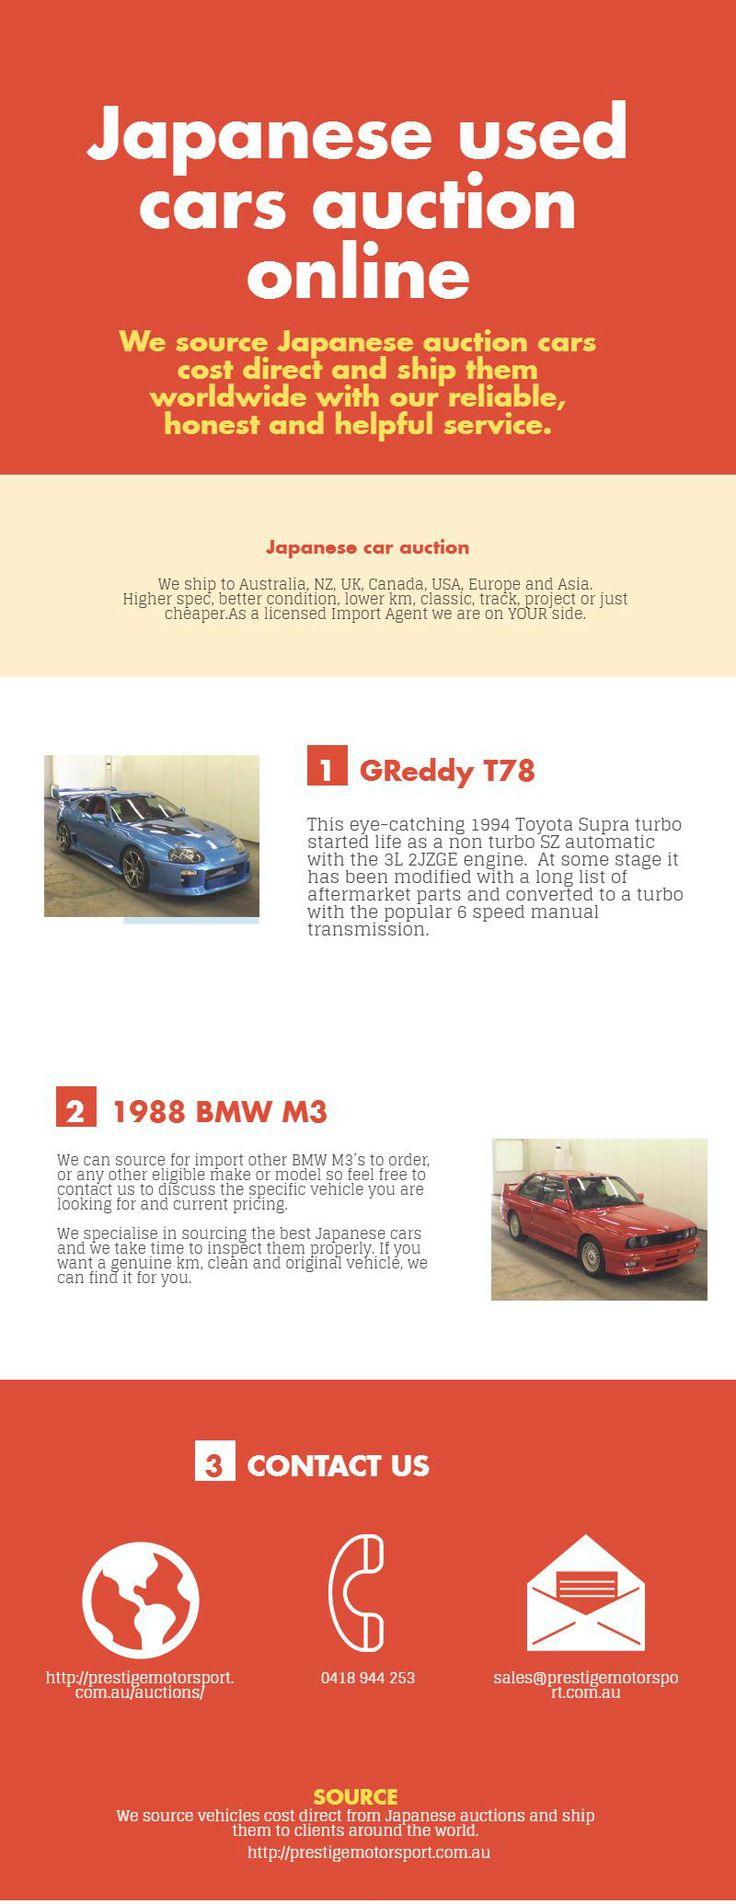 17 best Japanese Car Auction images on Pinterest   Japanese cars ...